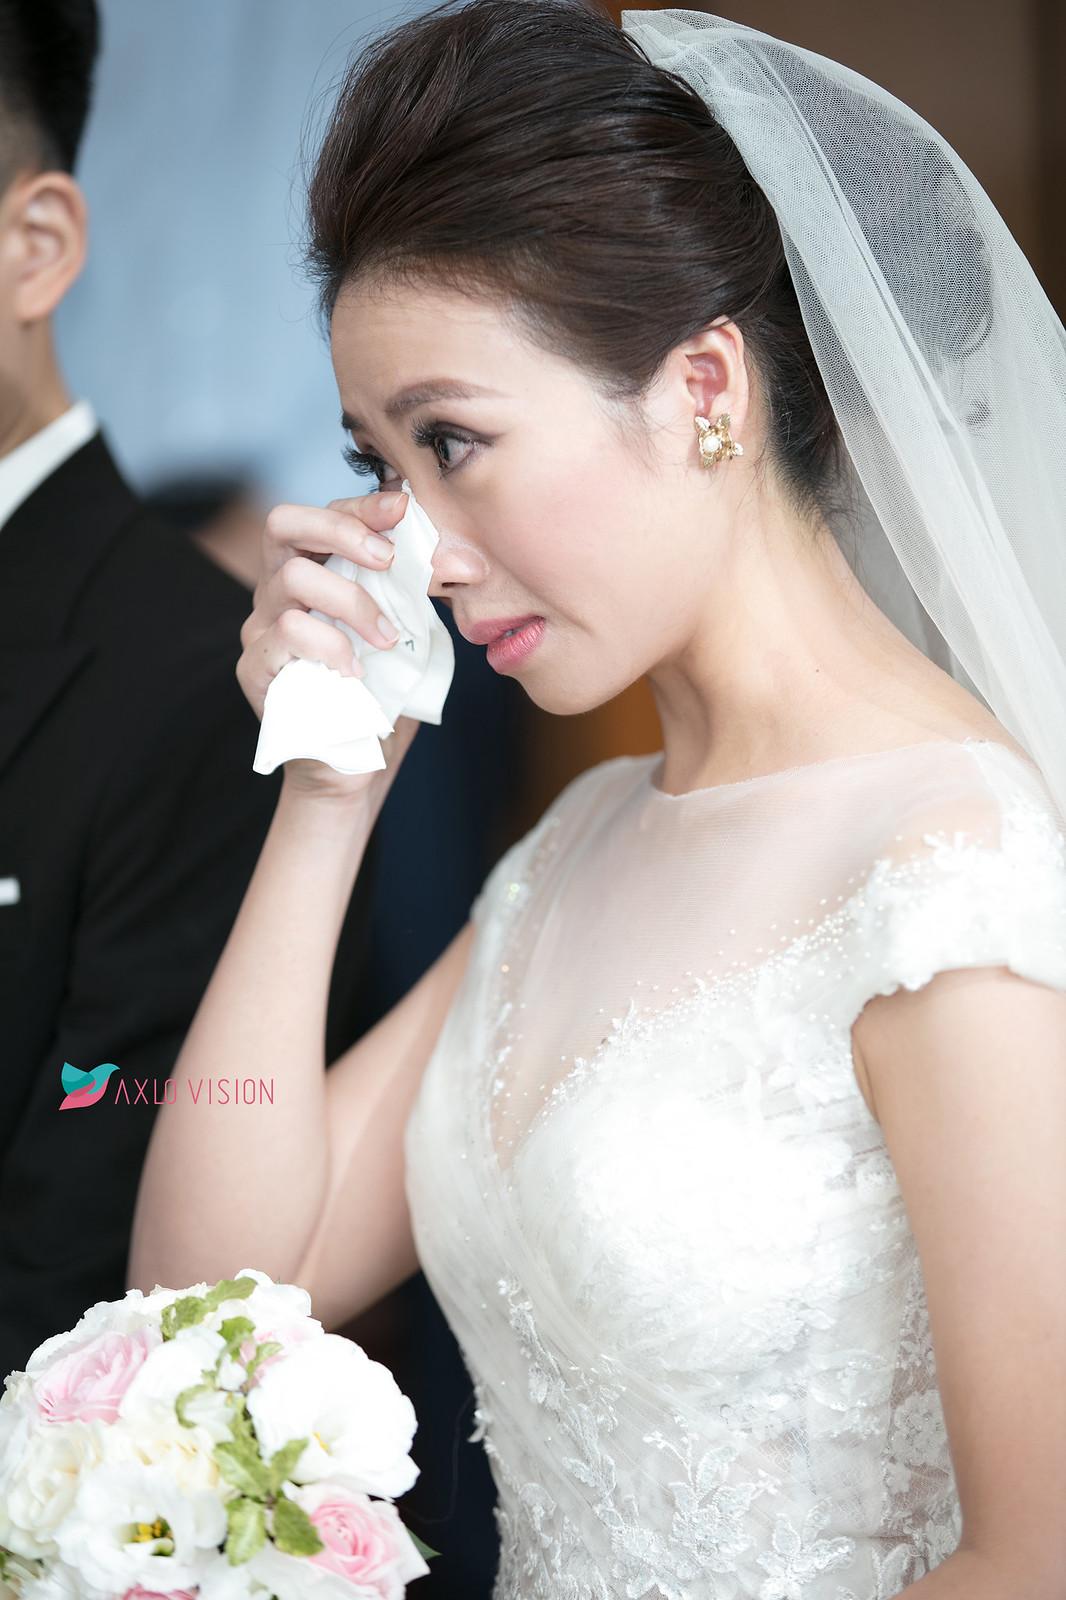 20170916 WeddingDay_093